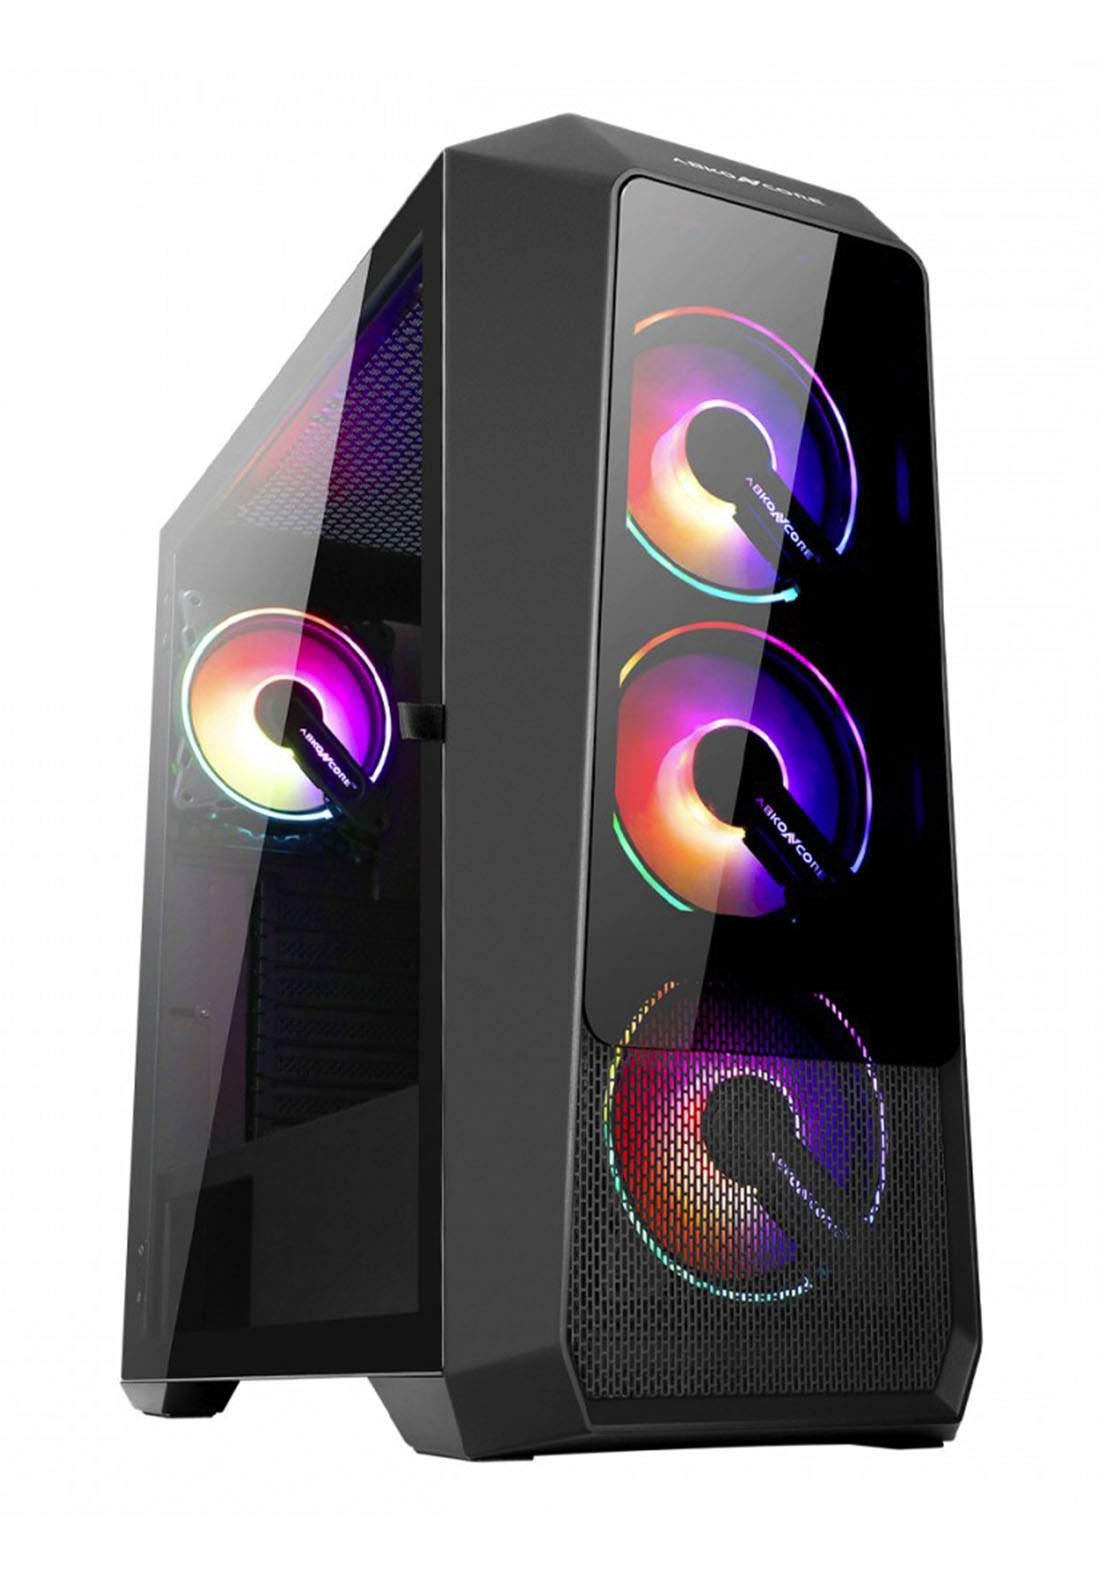 Abkoncore Helios H300G Sync PC Case - Black كيس حاسبة